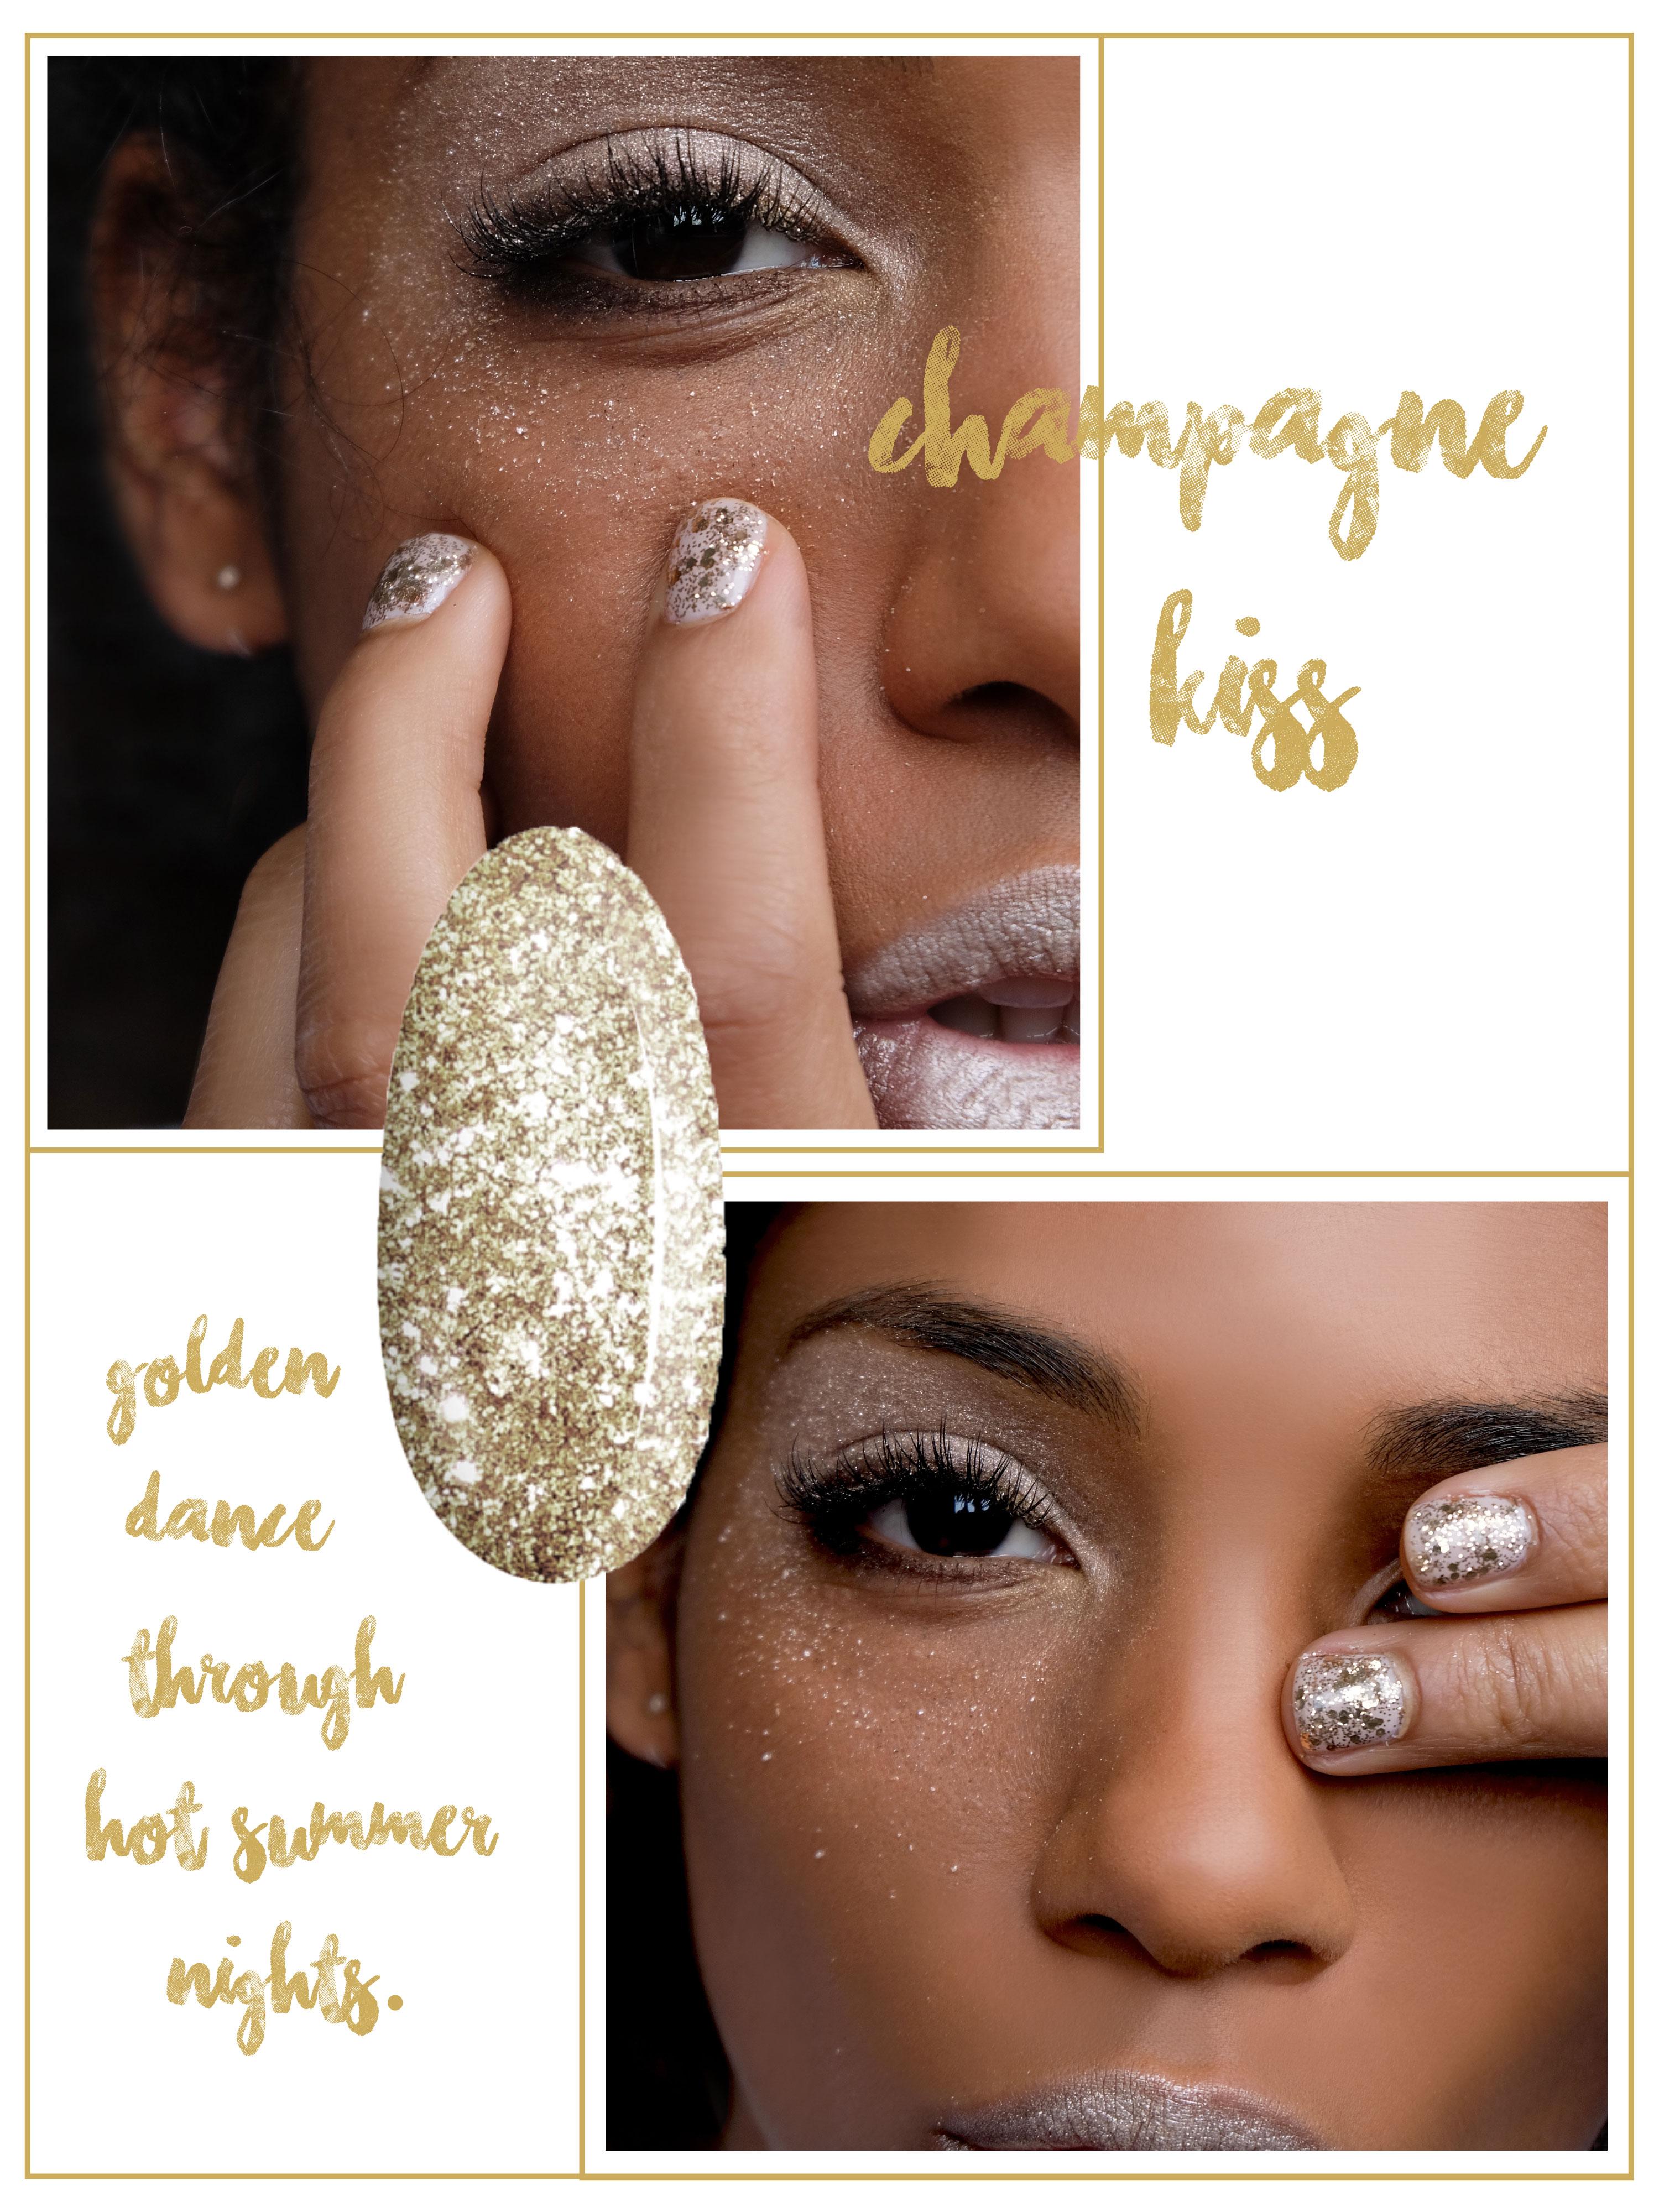 neo-nail-champagne-kiss